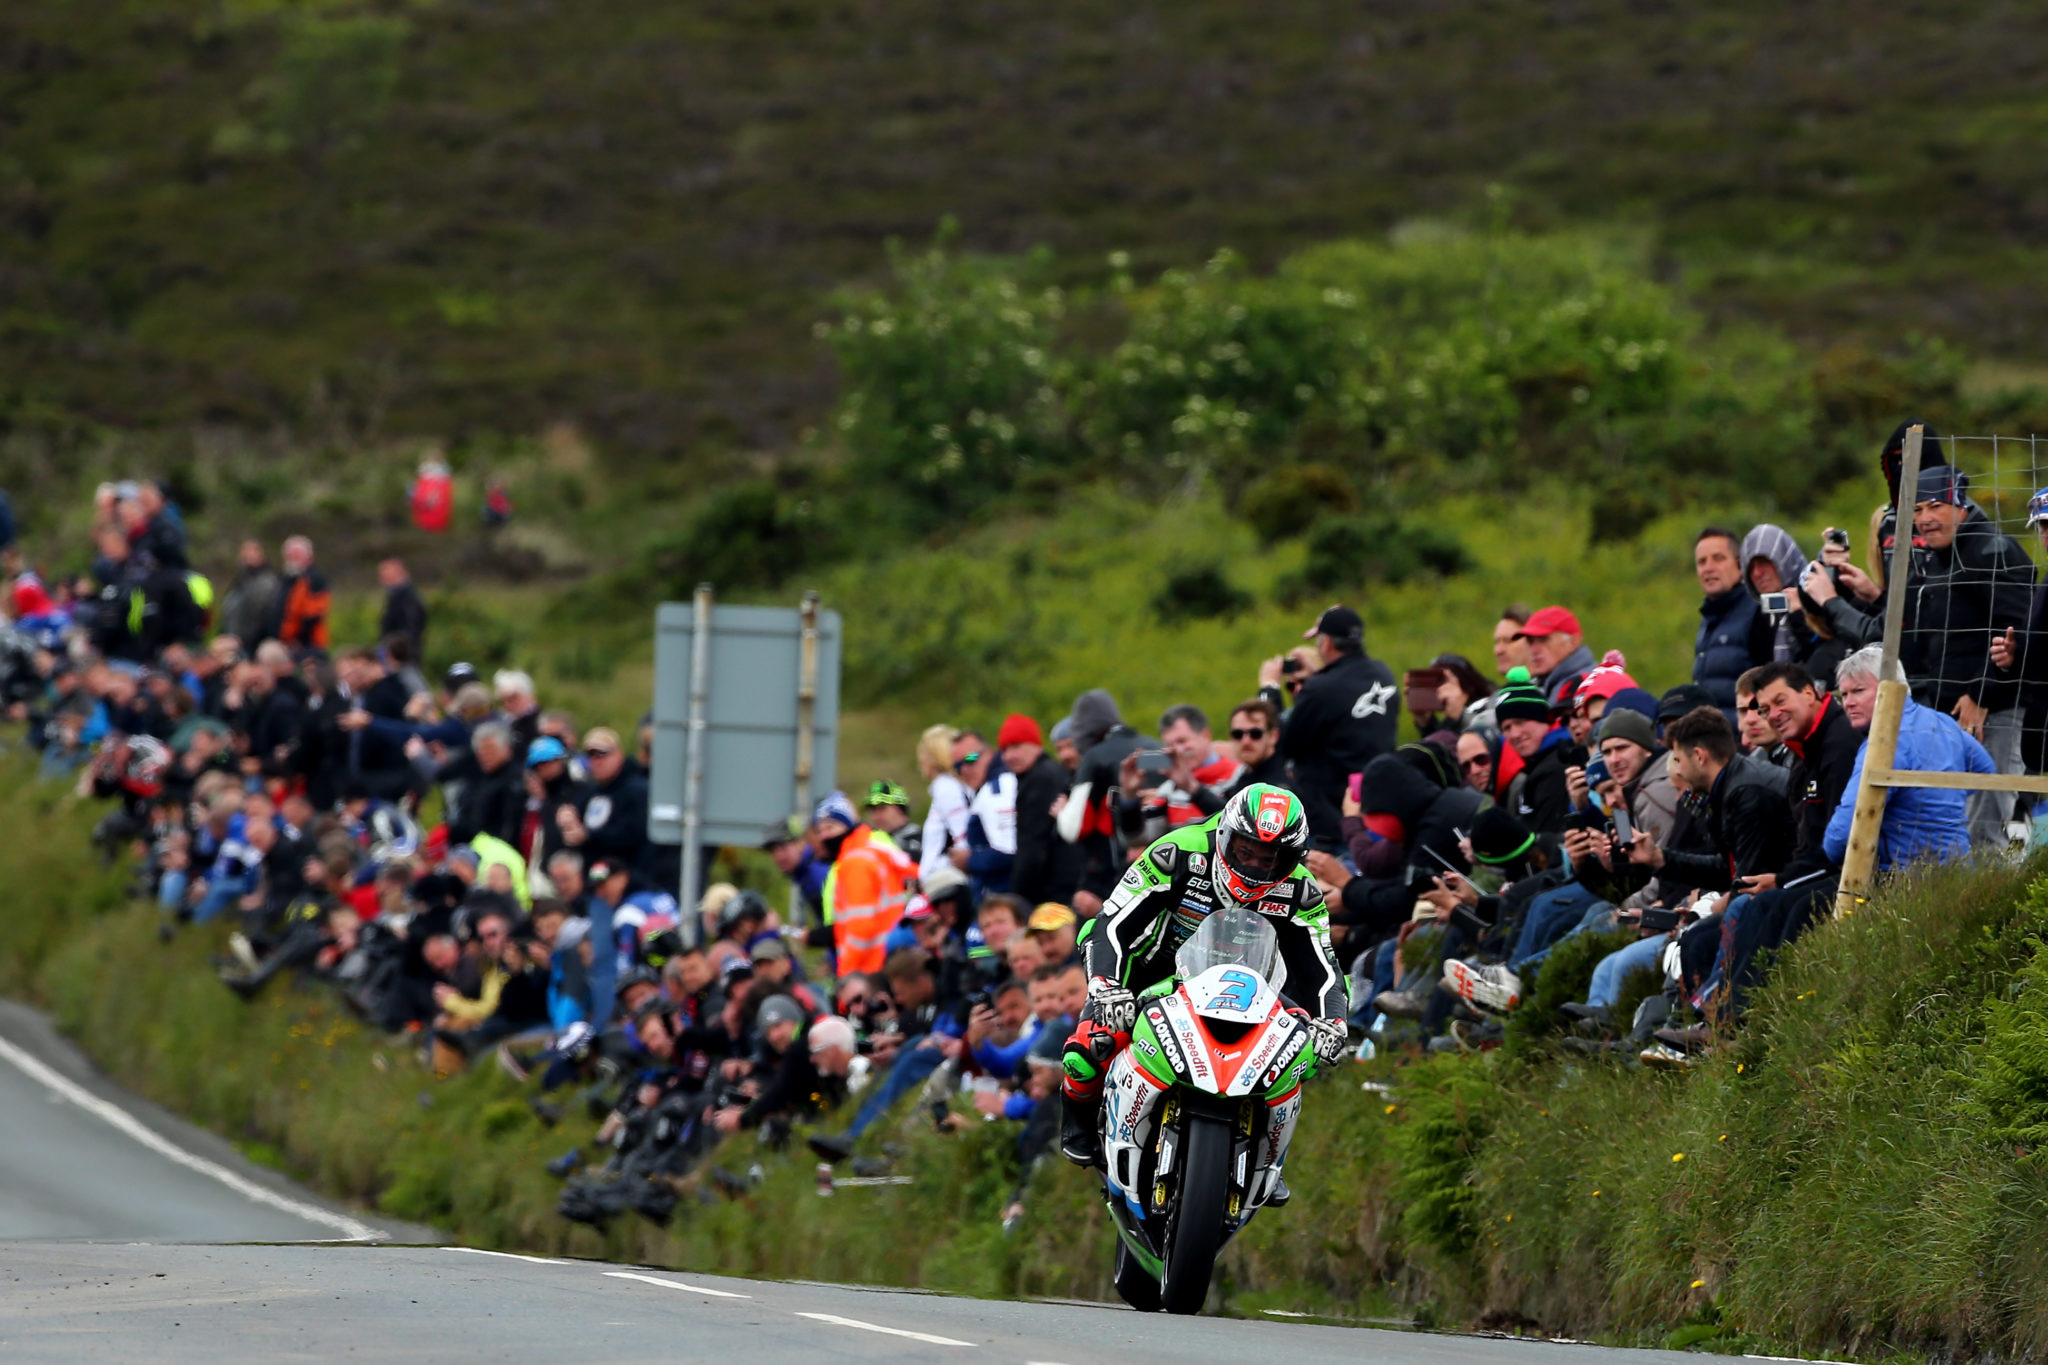 James Hillier was impressive at the TT credit Tim Keeton - Impact Images